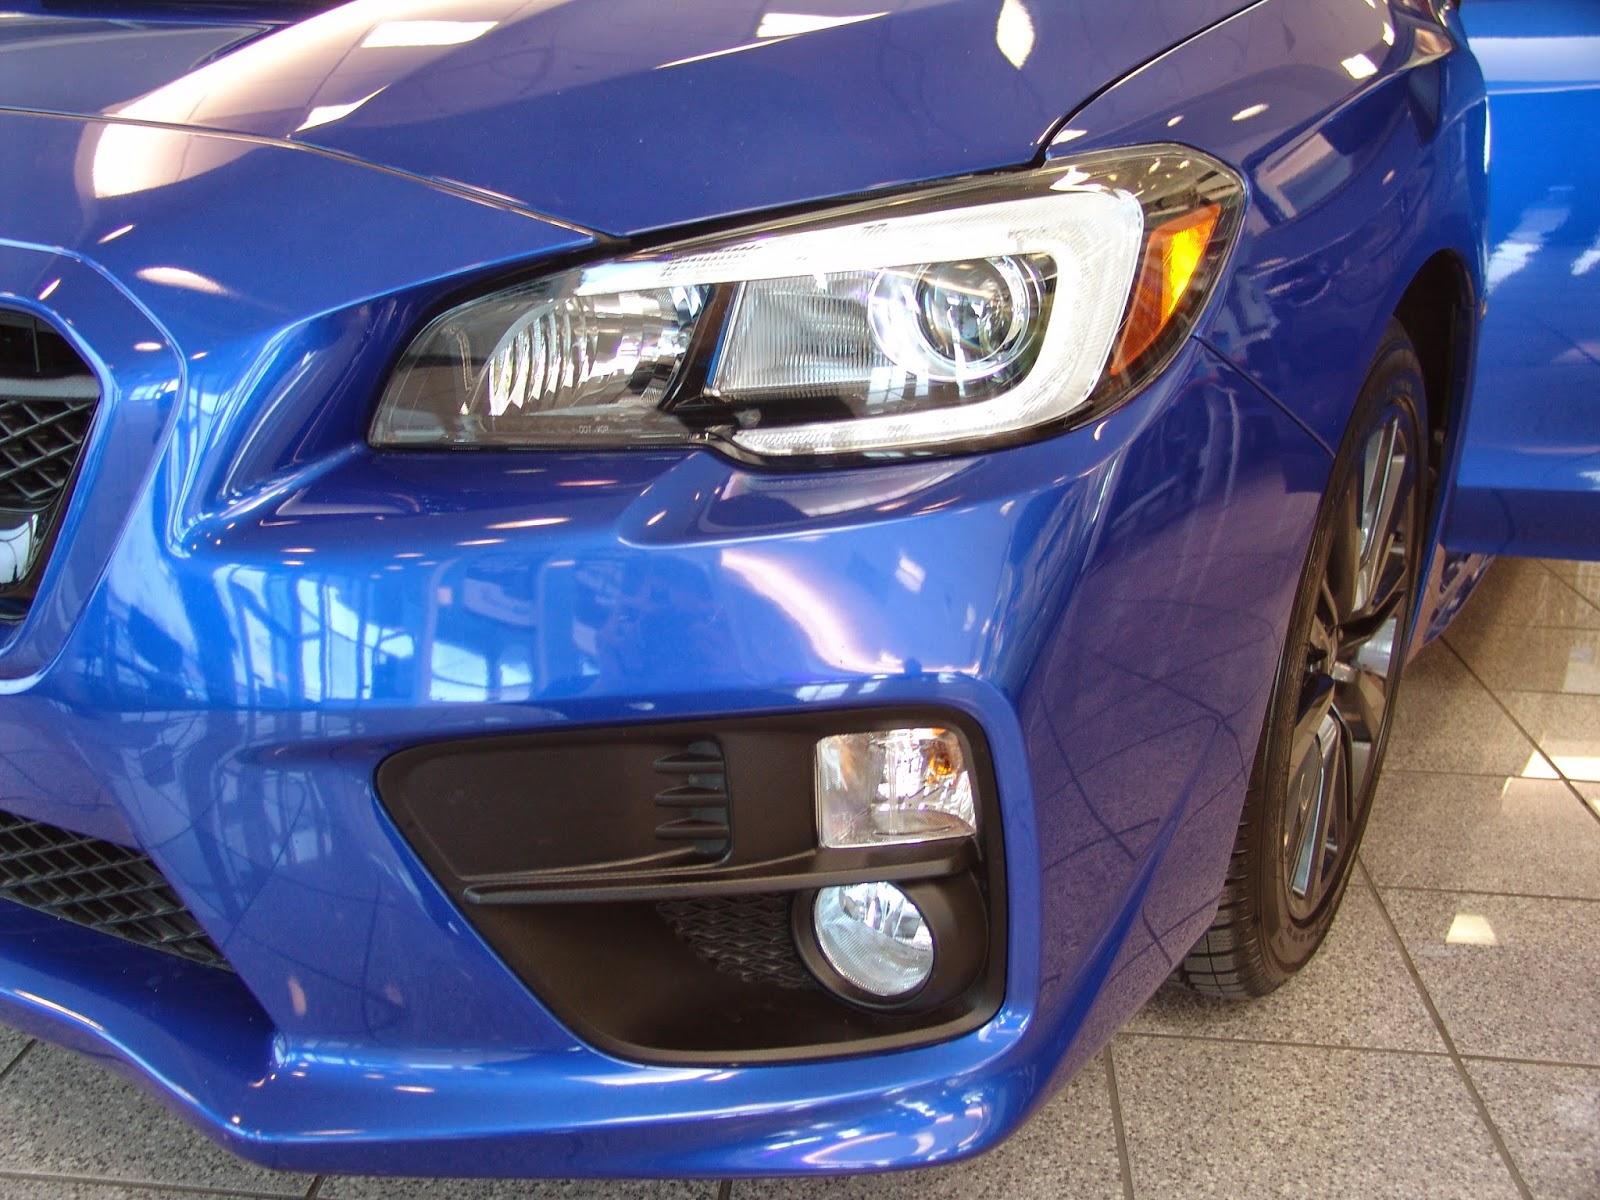 Utah Car Cents 2015 Wrx Walk Around Subaru Lights Wiring Diagram Thursday March 20 2014